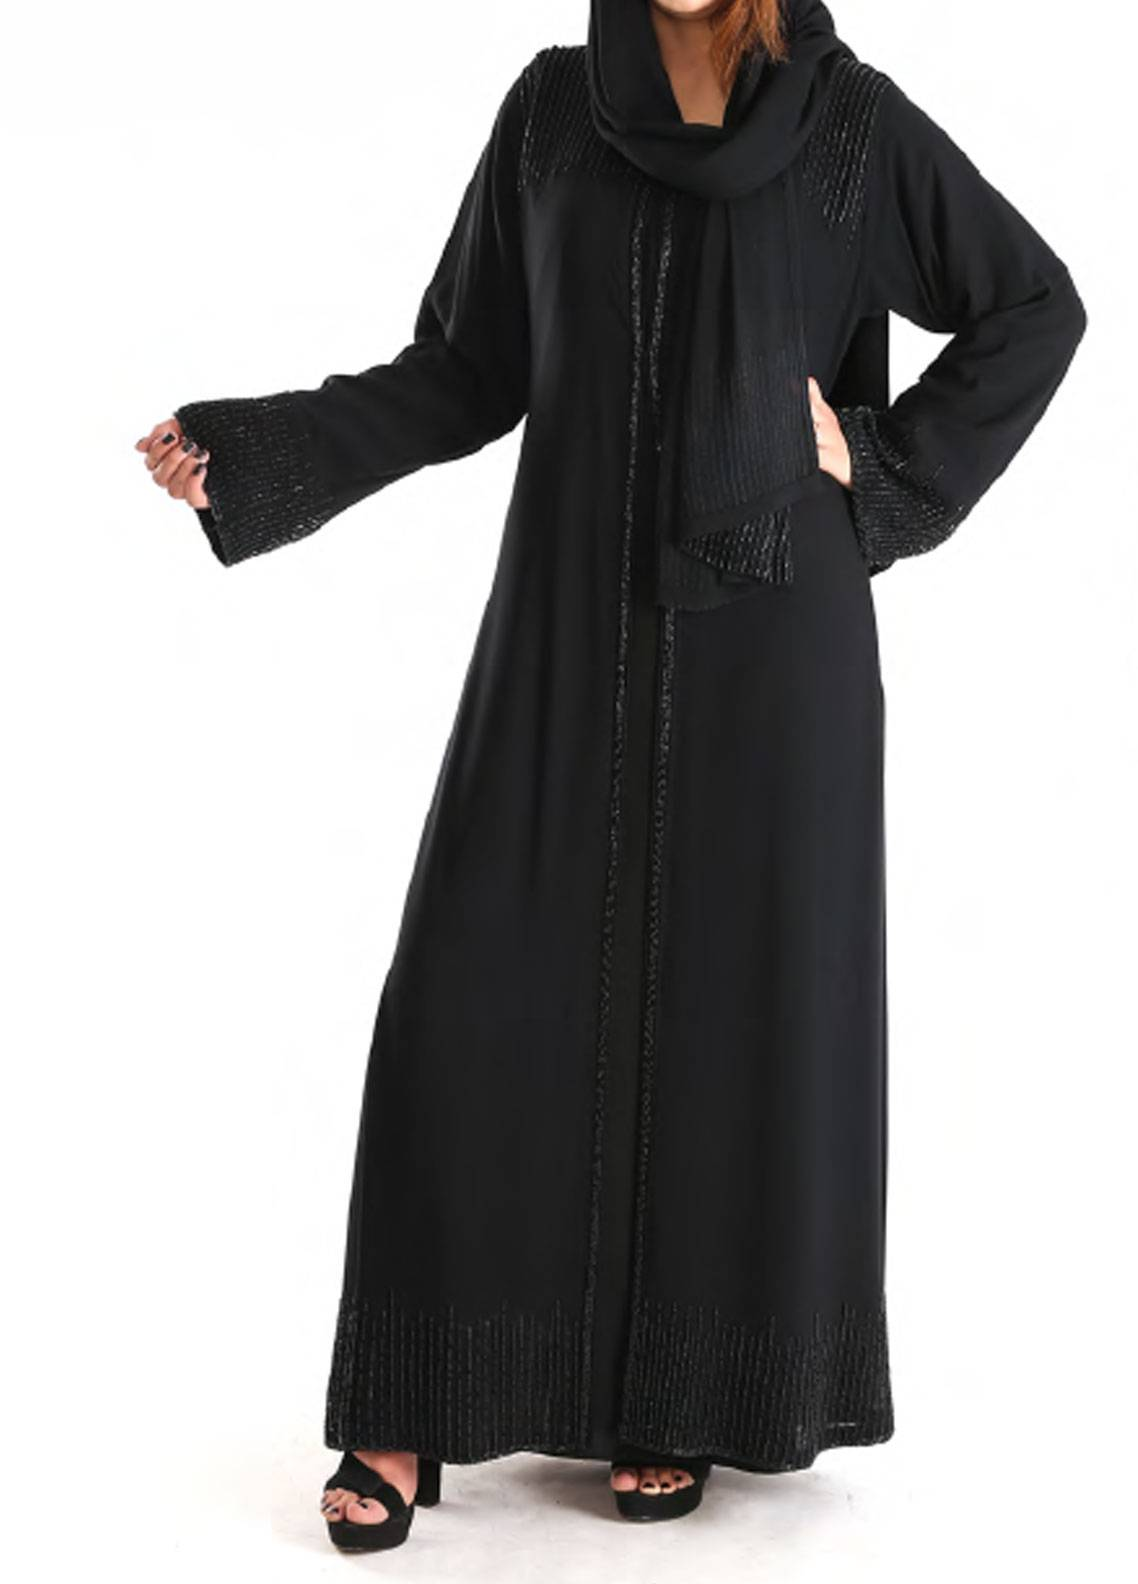 Hijab ul Hareem Formal Wool Chiffon Stitched Abaya 0121-J-995